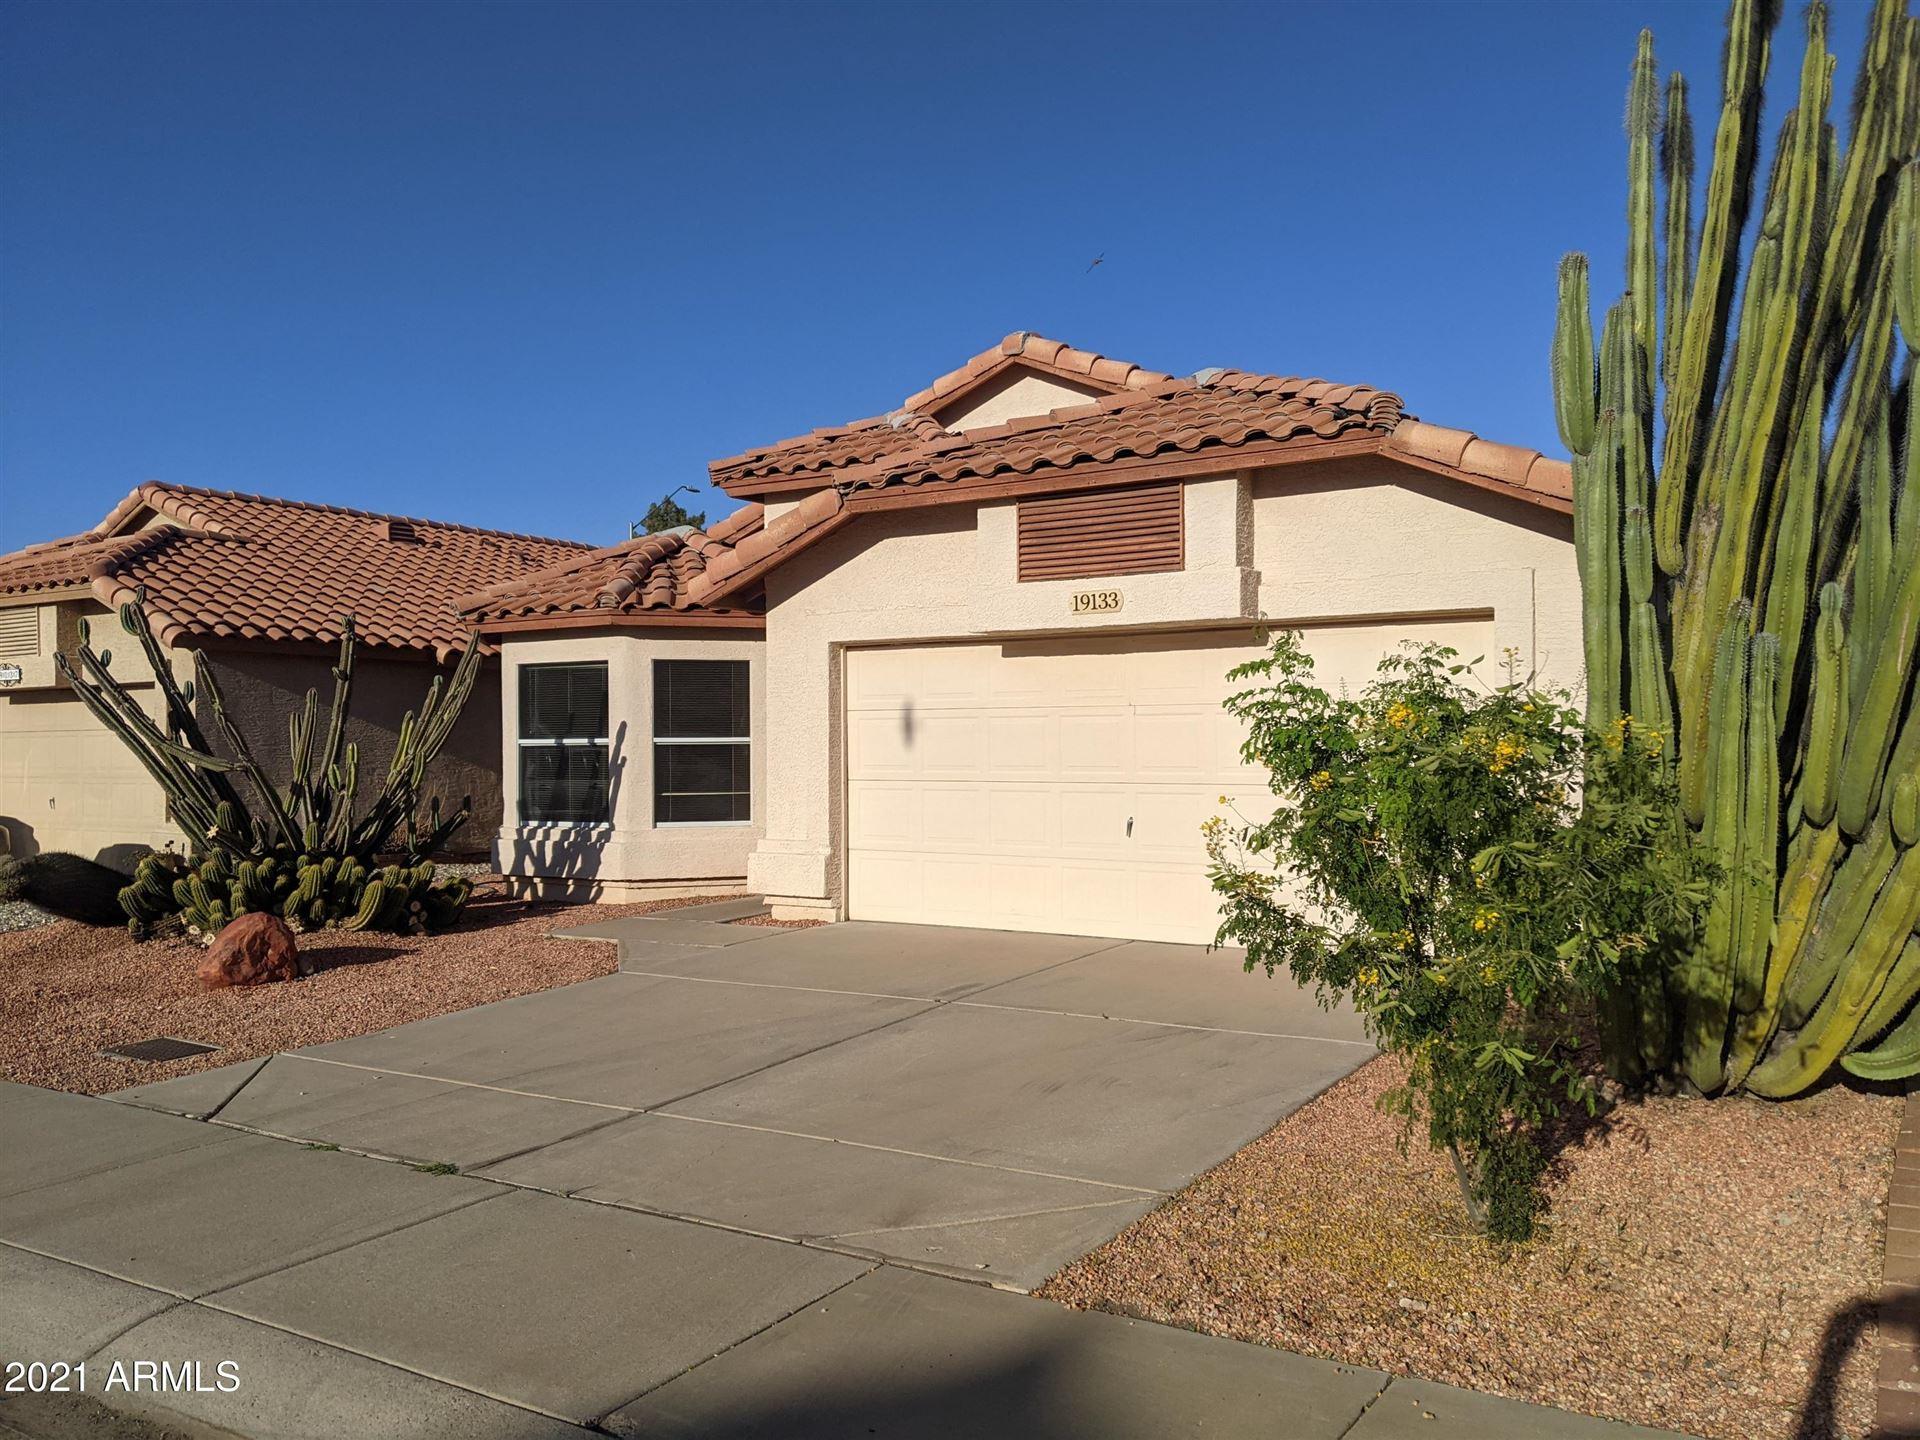 Photo of 19133 N 75TH Drive, Glendale, AZ 85308 (MLS # 6231280)